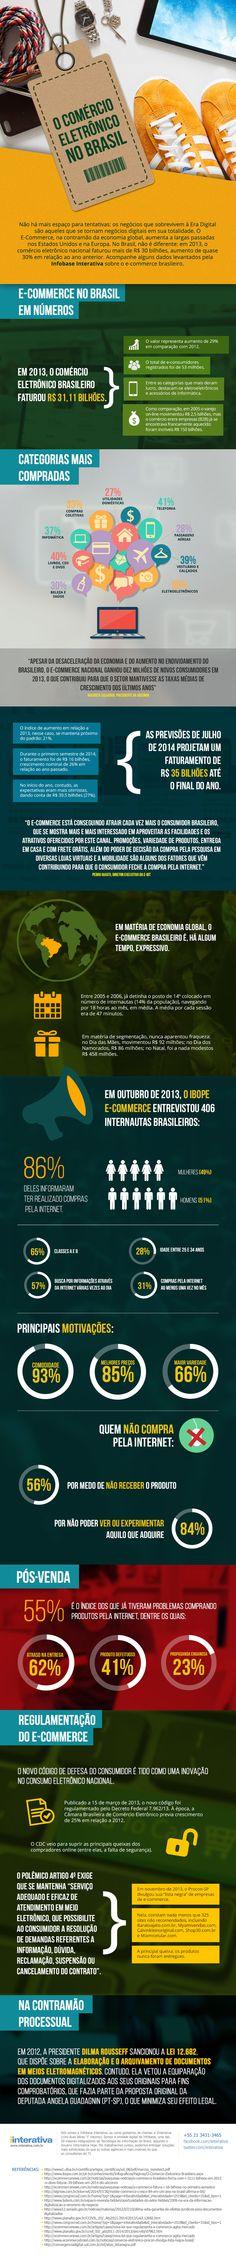 Infográfico – O comércio eletrônico no Brasil http://www.iinterativa.com.br/infografico-comercio-eletronico-brasil/#p1zGq8G1YCJF8ZWd.99